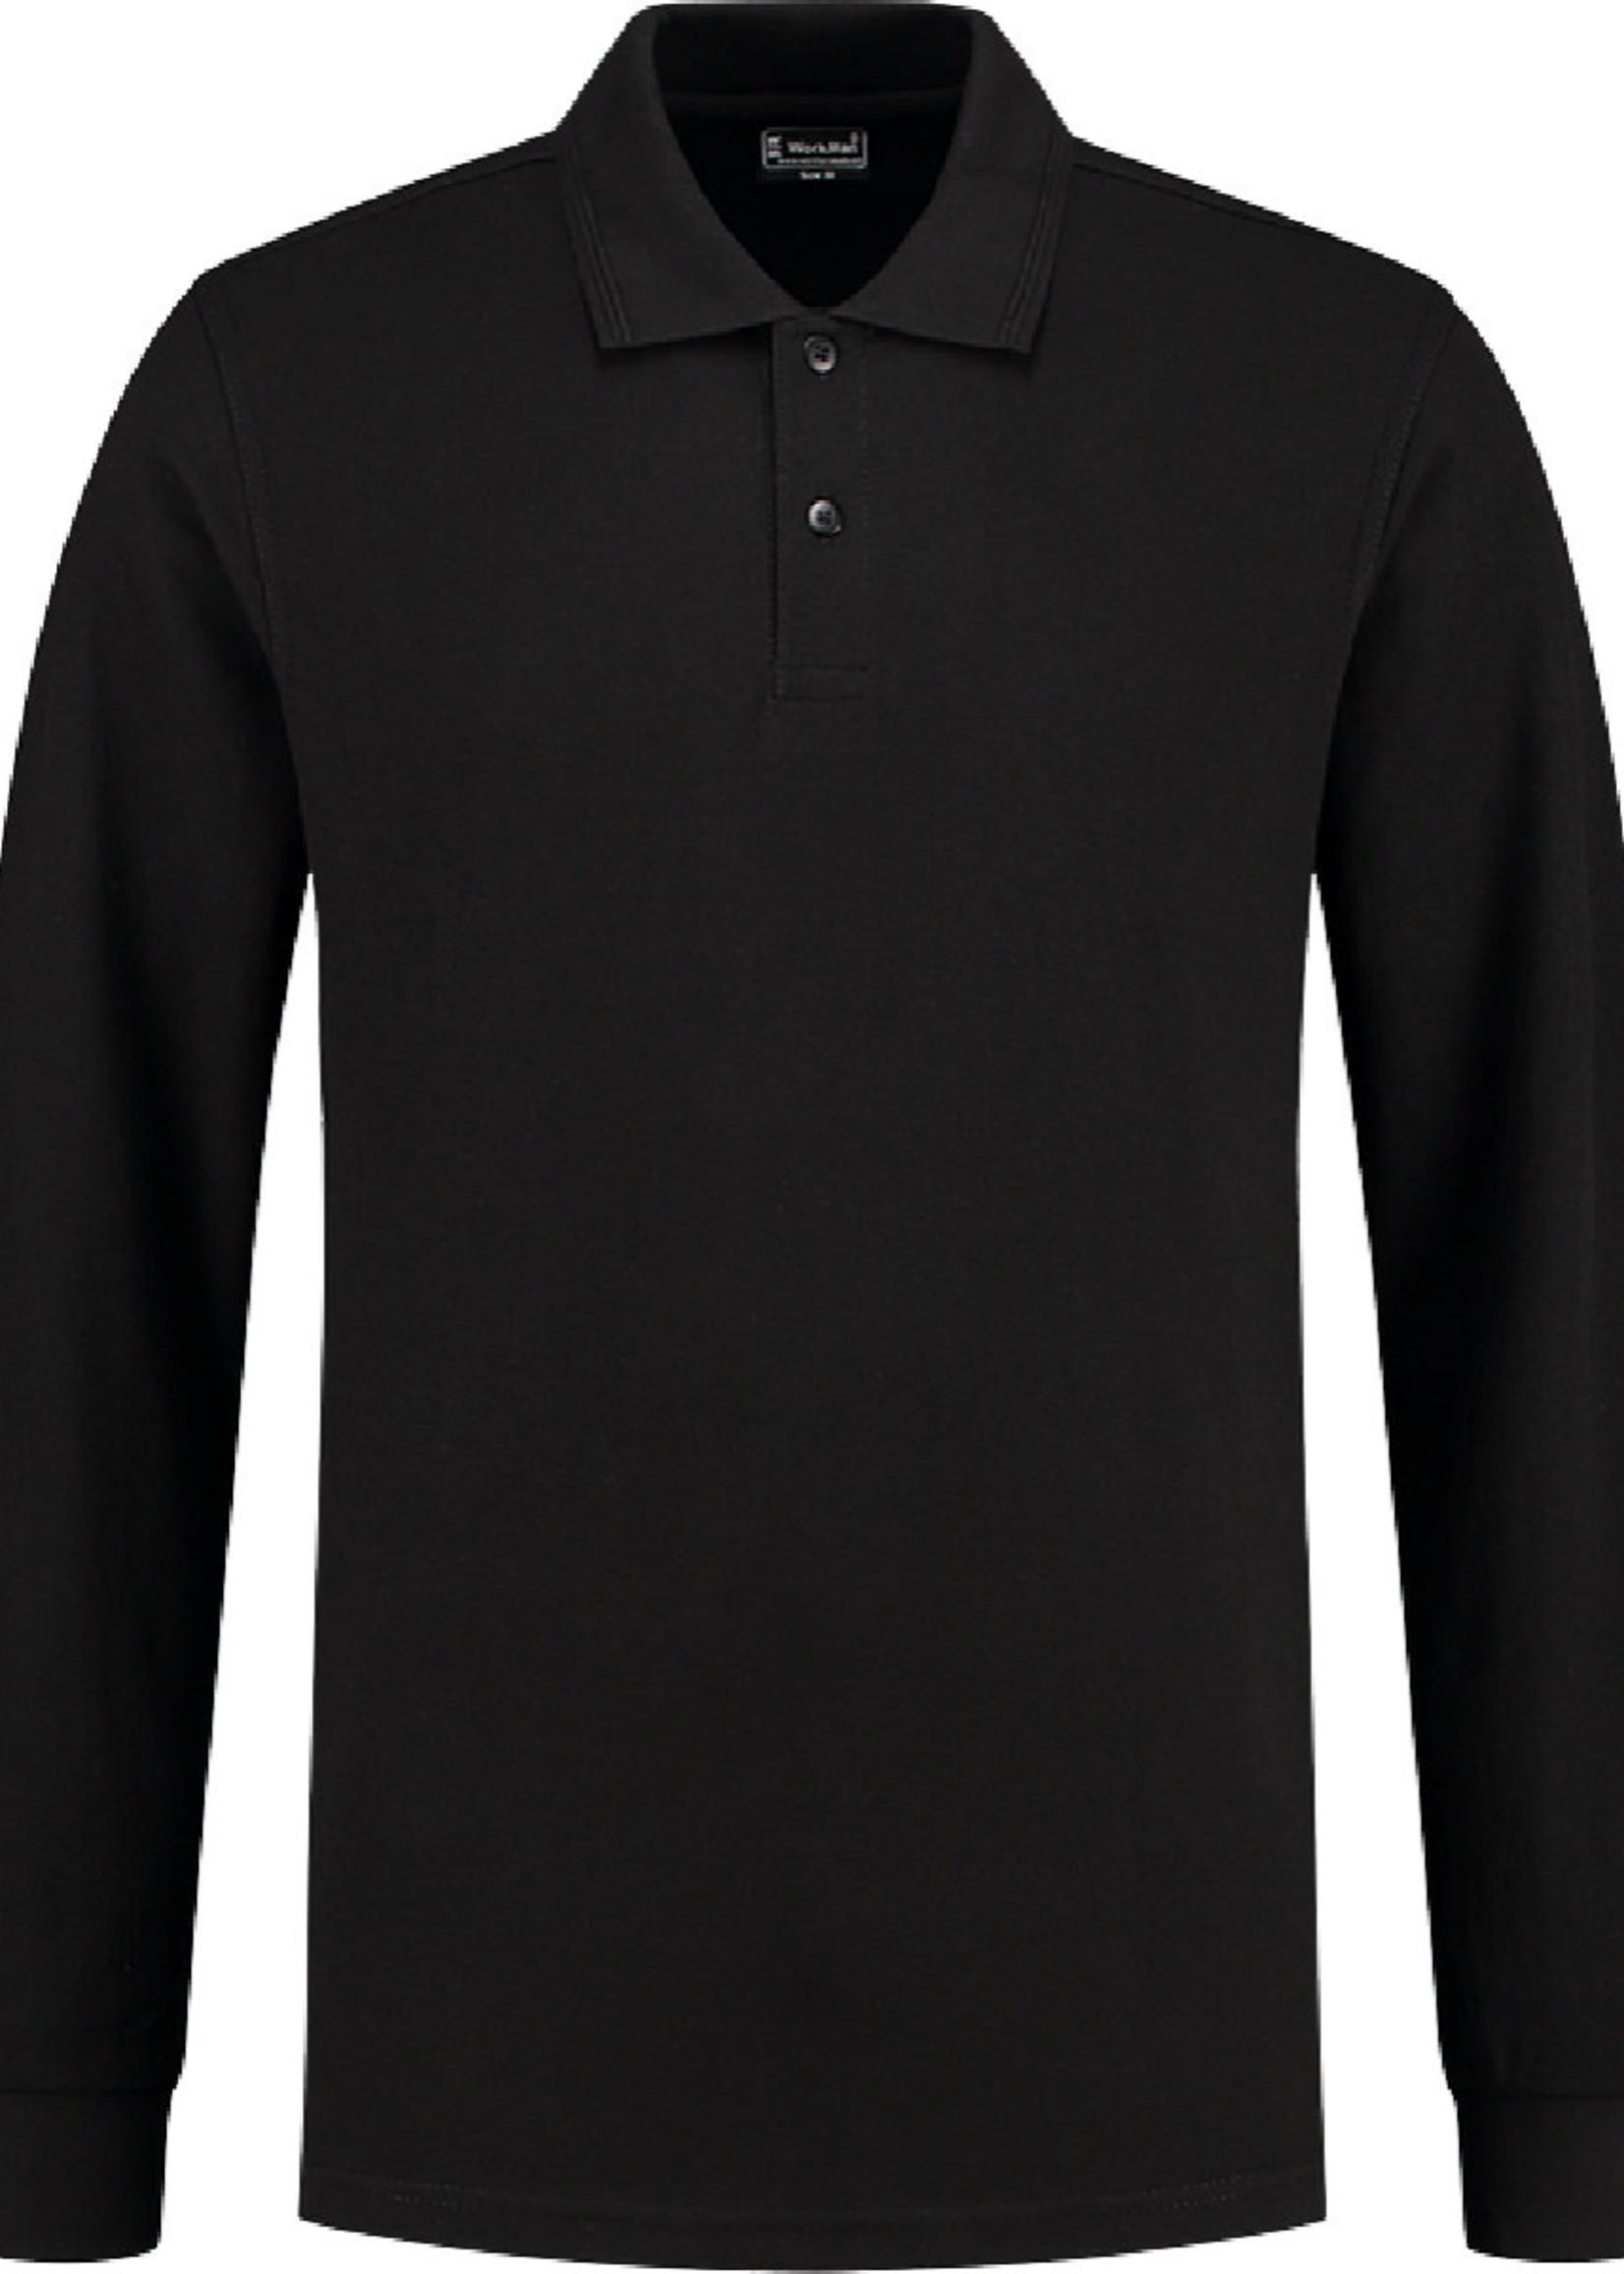 Workman Poloshirt Outfitters Longsleeve